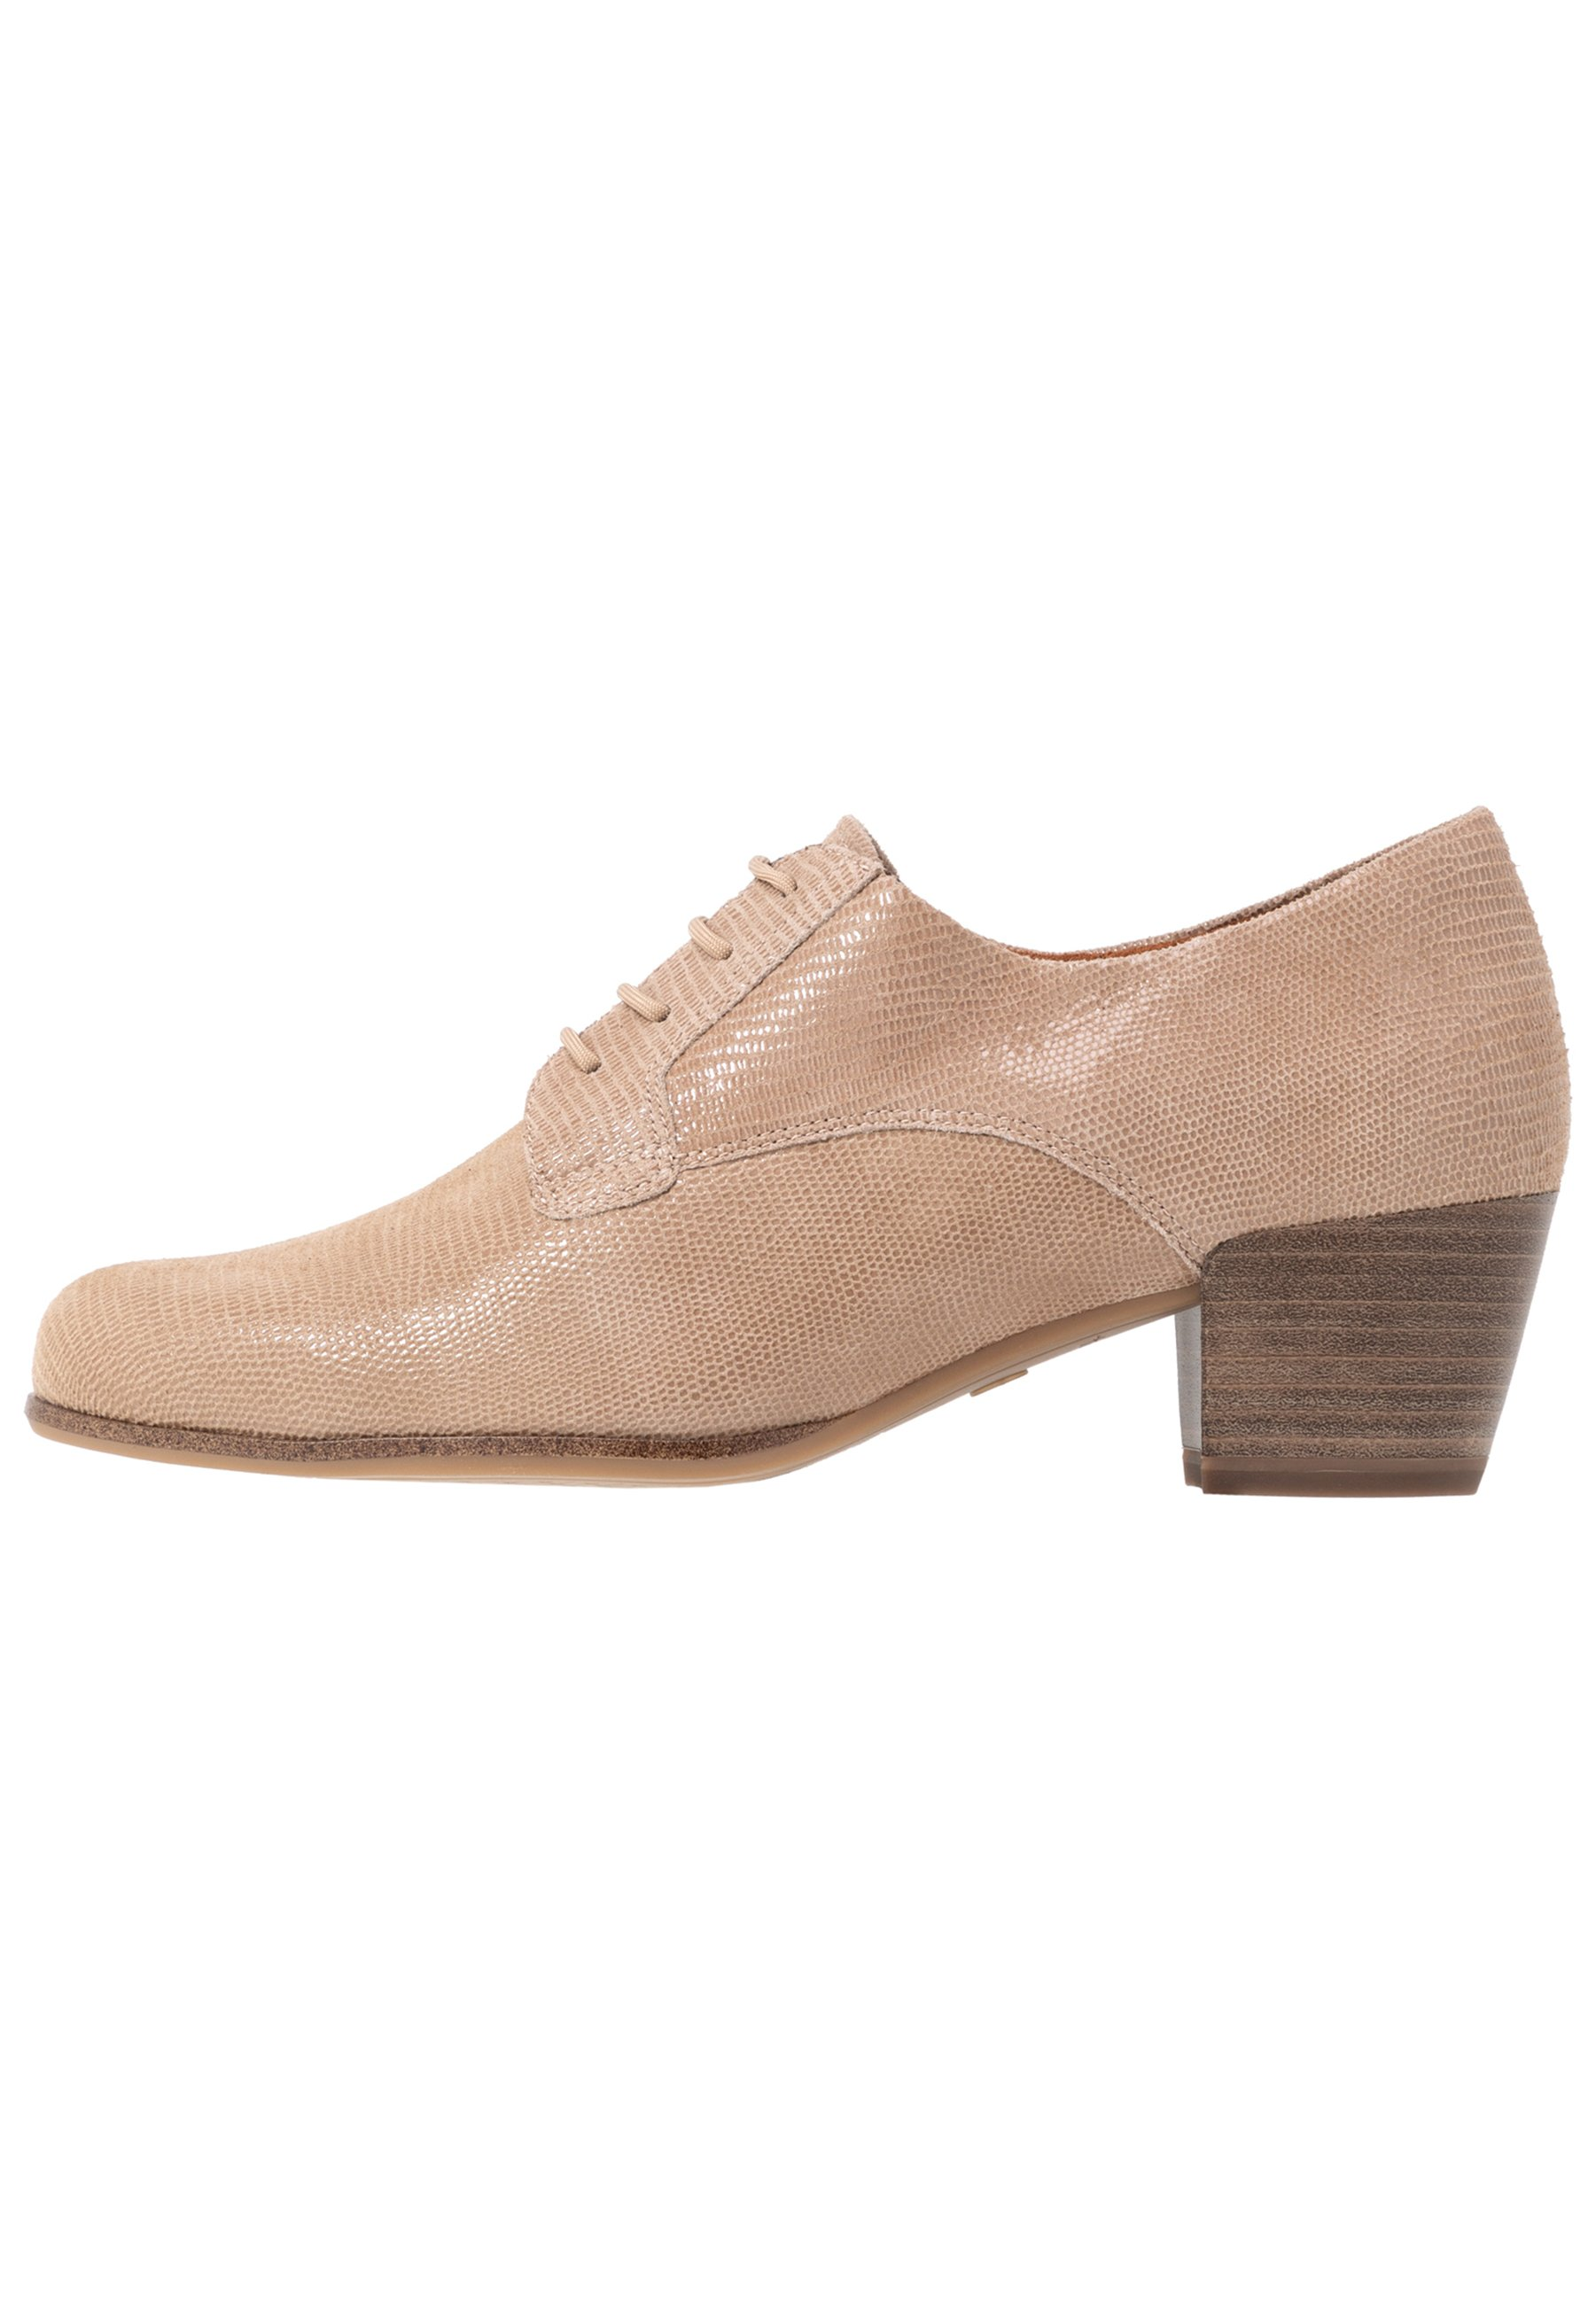 Tamaris Ankle Boot - Beige Black Friday